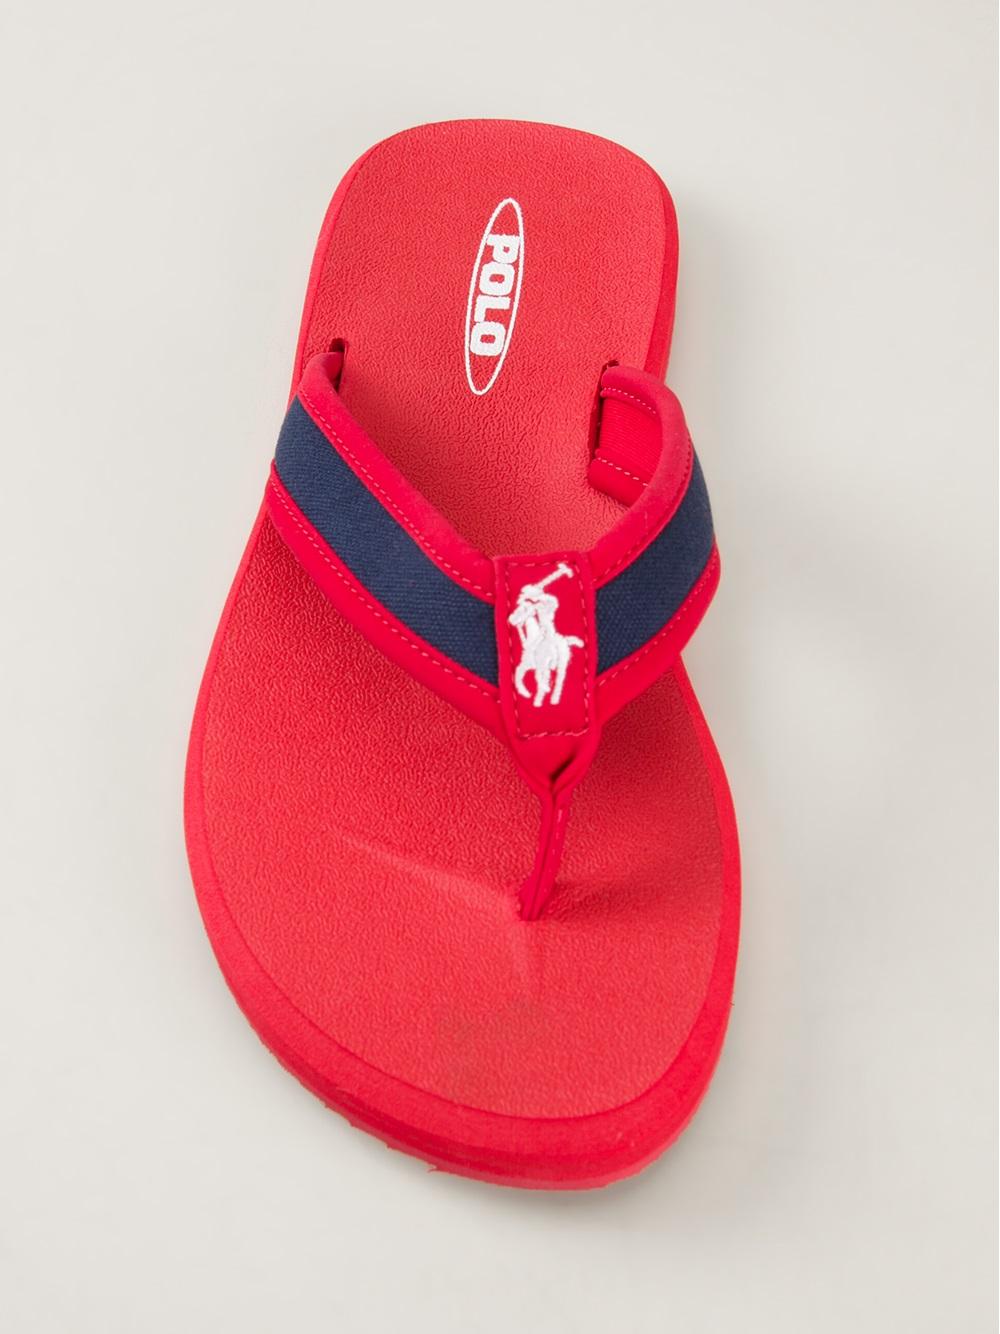 440470c45da Polo Ralph Lauren Almer Flip Flops in Red for Men - Lyst